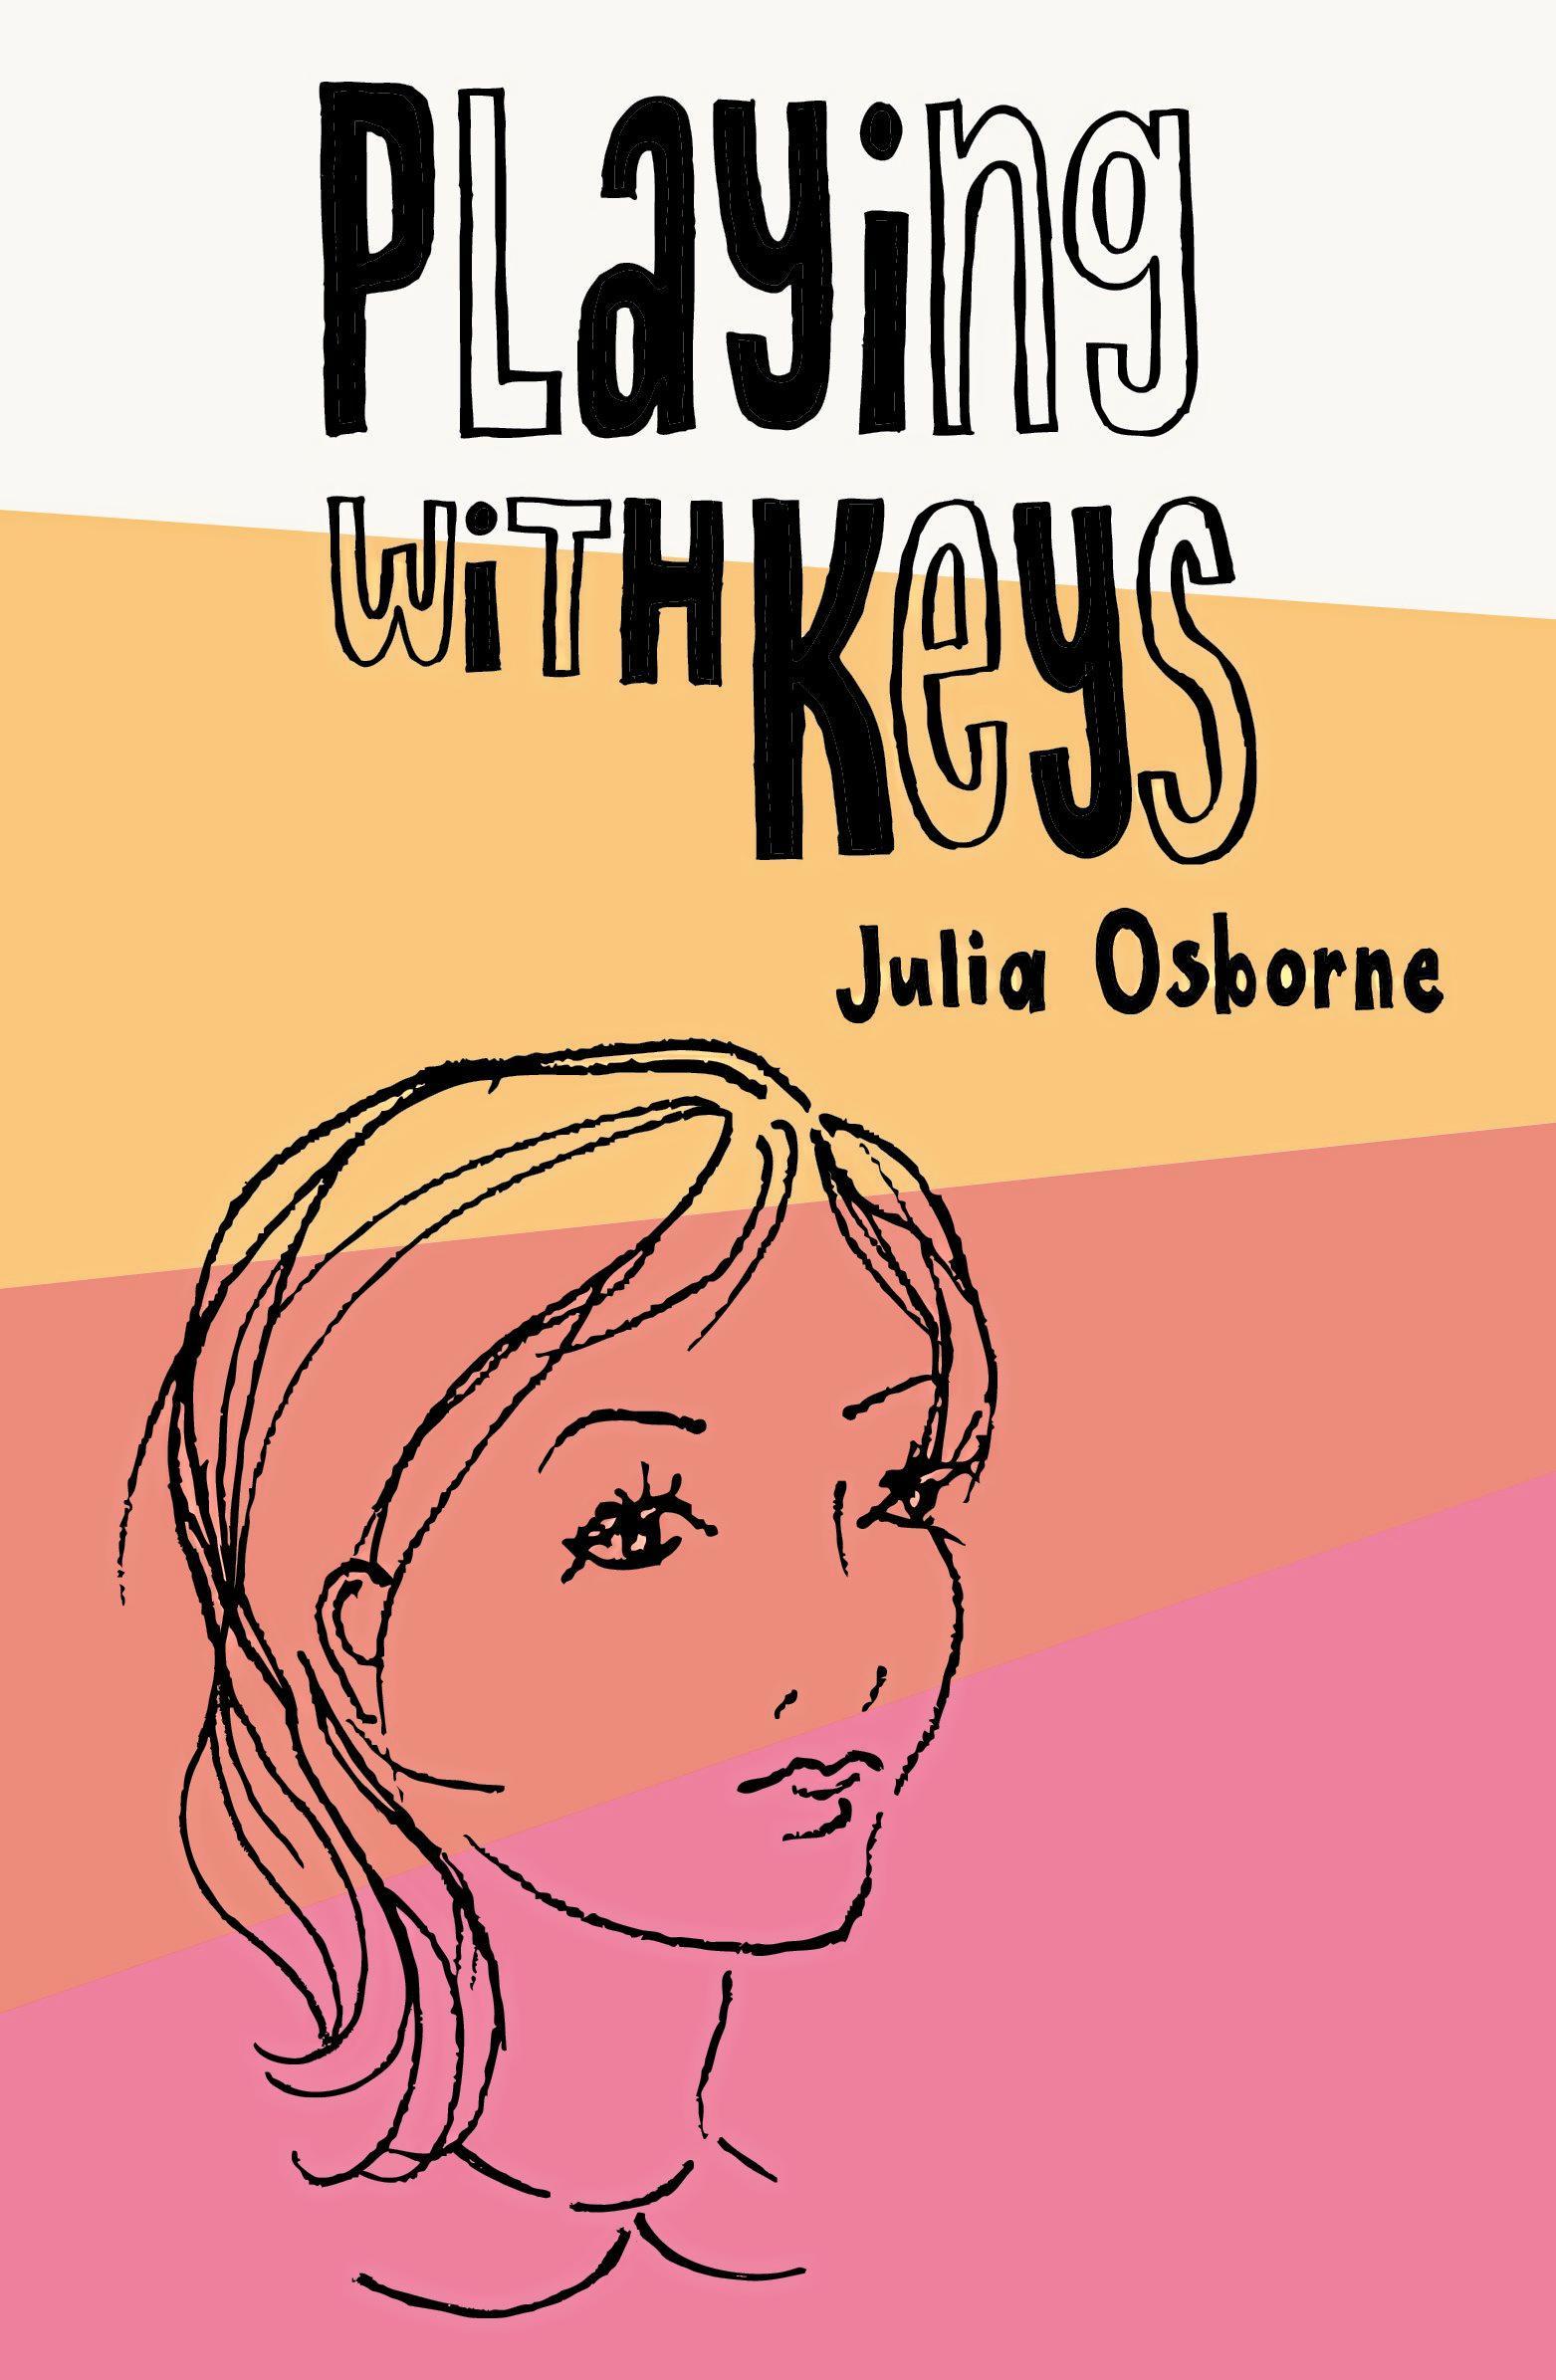 AUTHOR: Julia Osborne's Playing with Keys,